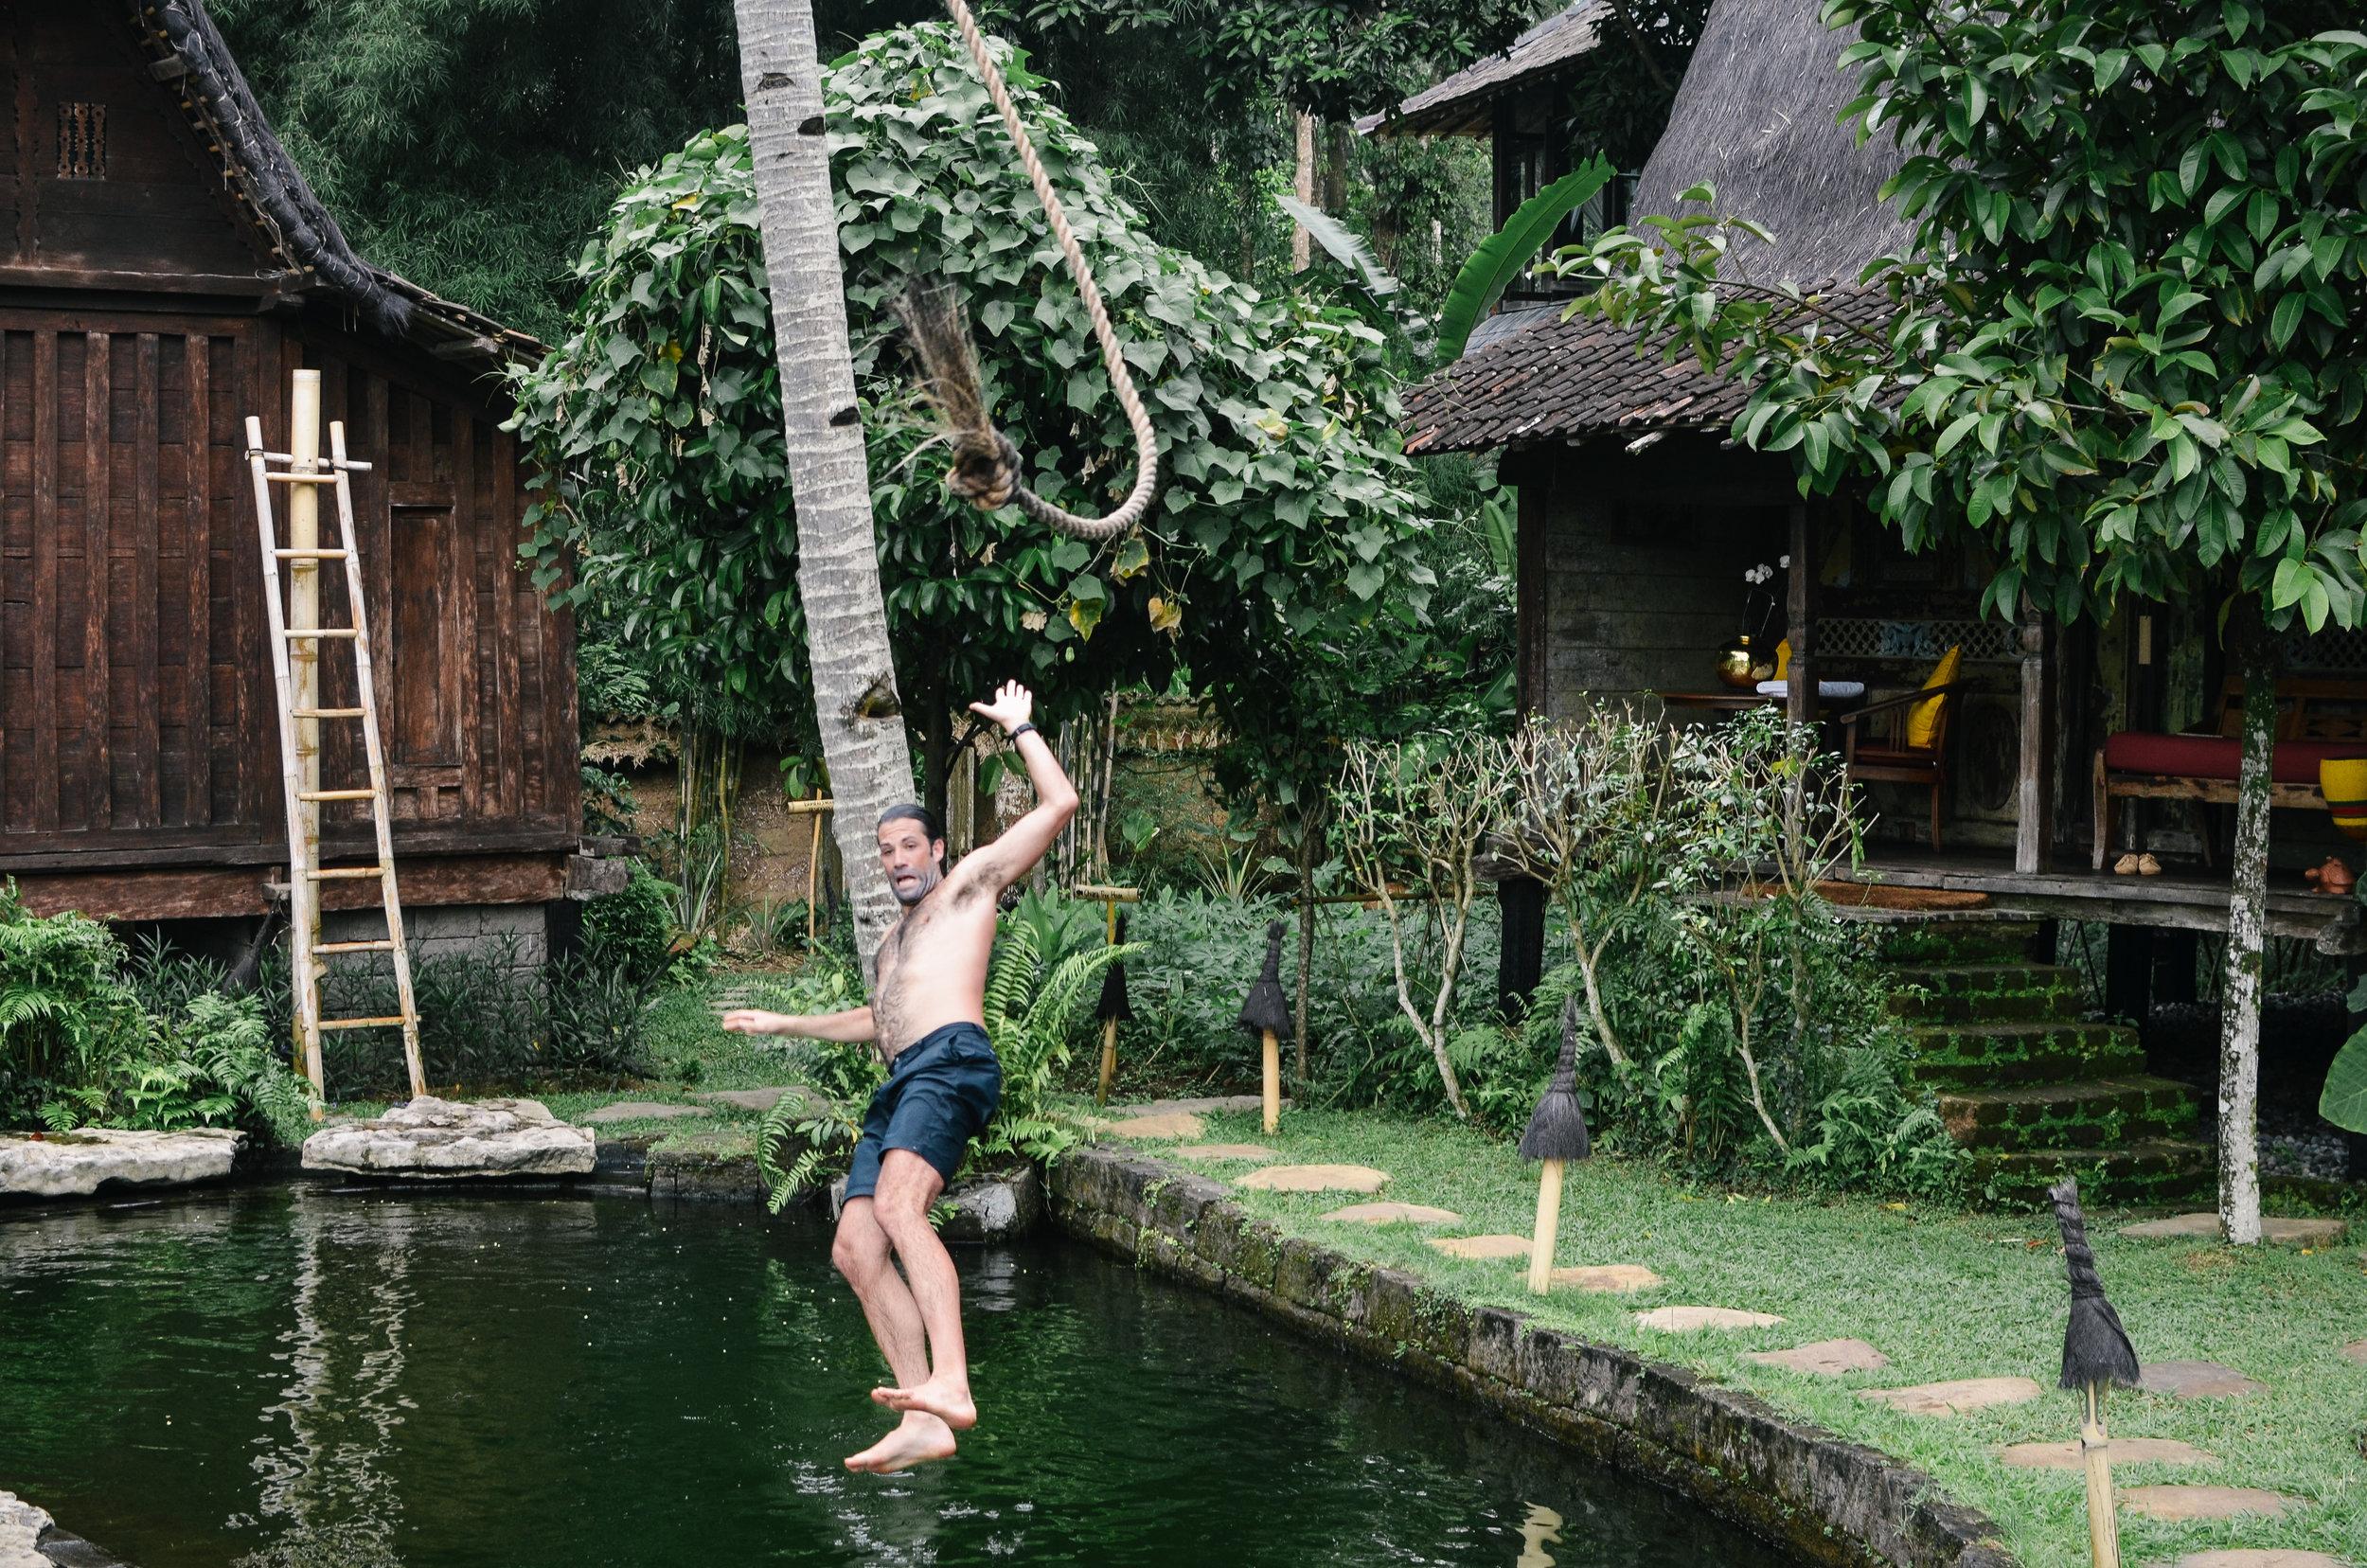 bali+mosca+bamboo+lodge+bali+ubud+lifeonpine_DSC_2878.jpg